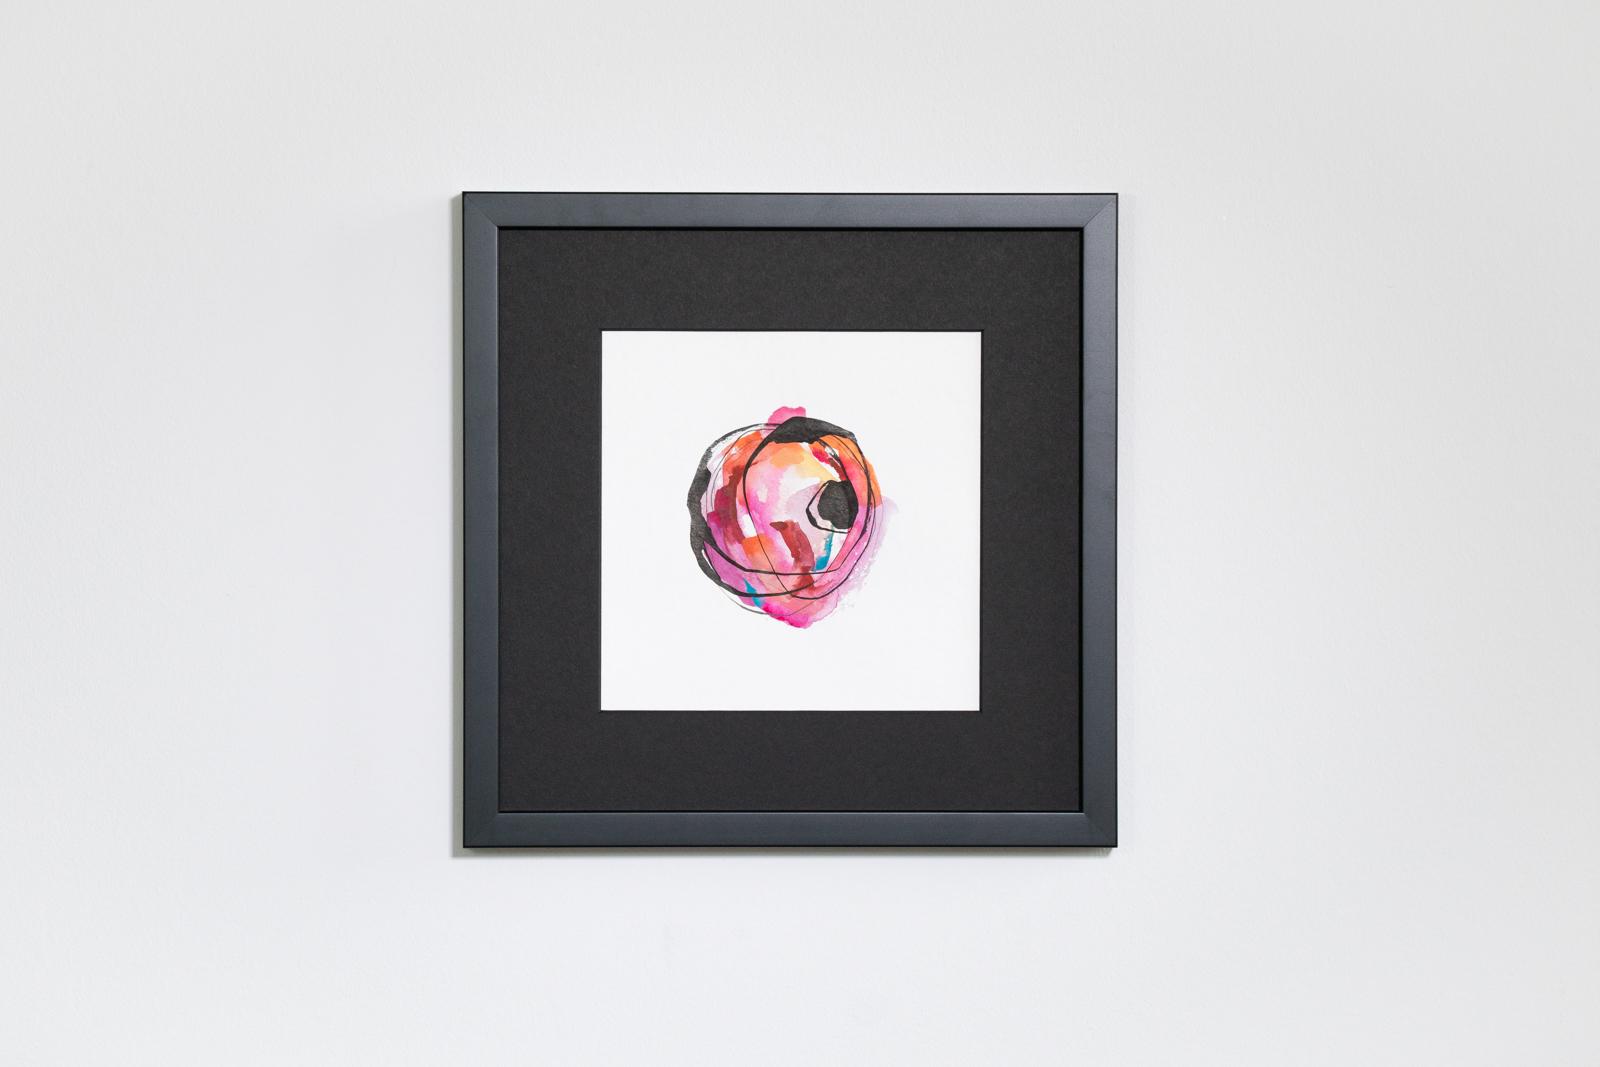 2018_StudioRehme_Ruetten_Paintings-12.jpg